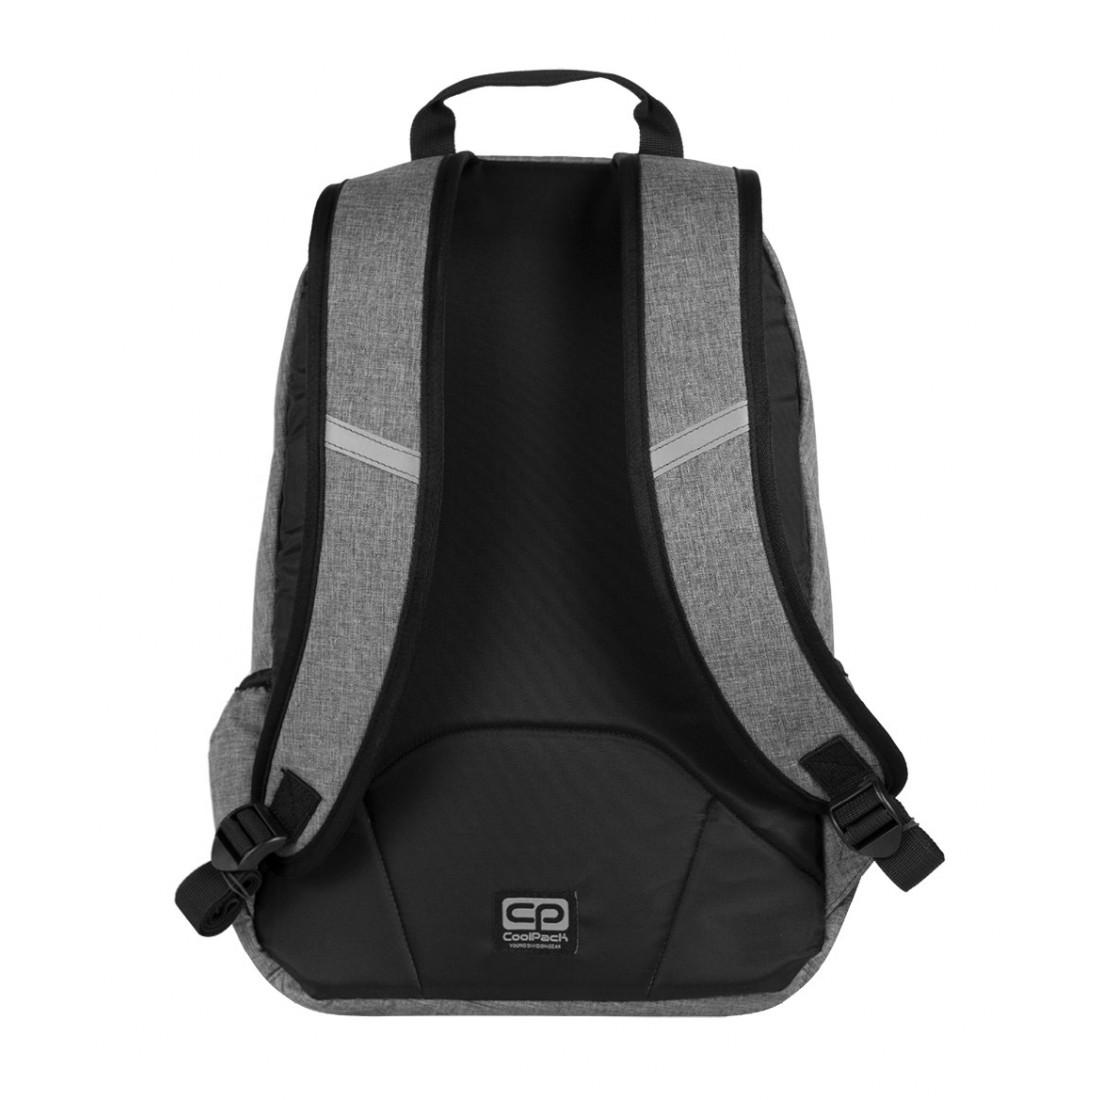 Plecak młodzieżowy na laptop CoolPack CP szary RAMBLER SNOW GREY 593 - plecak-tornister.pl